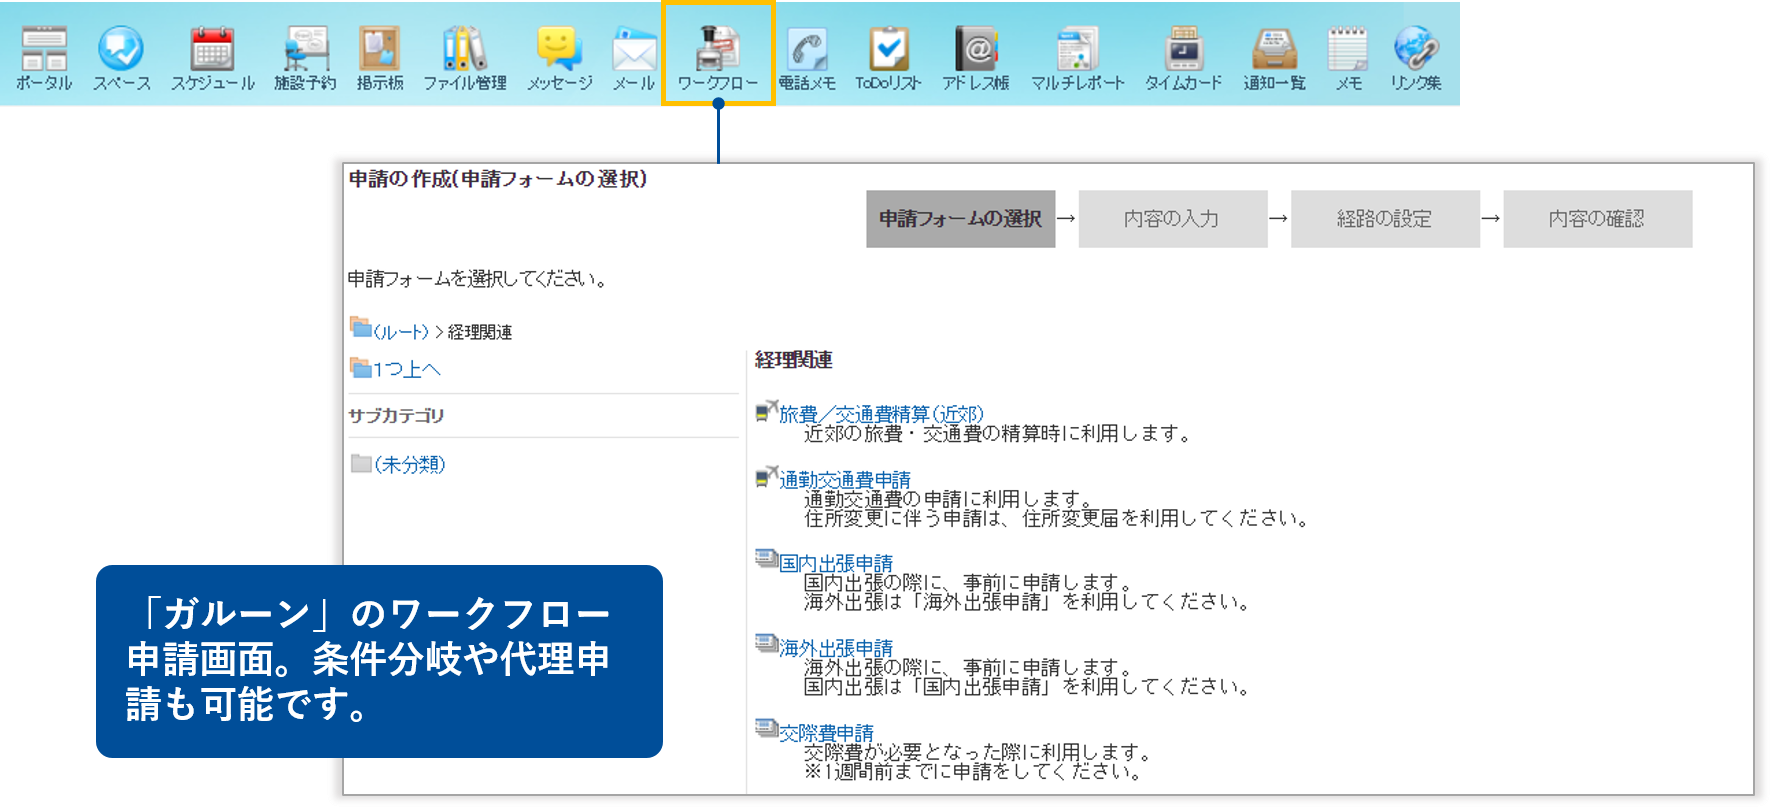 https://enterprise.cybozu.co.jp/79ce64bff8e364d96ac3553e628ae02079914eed.png